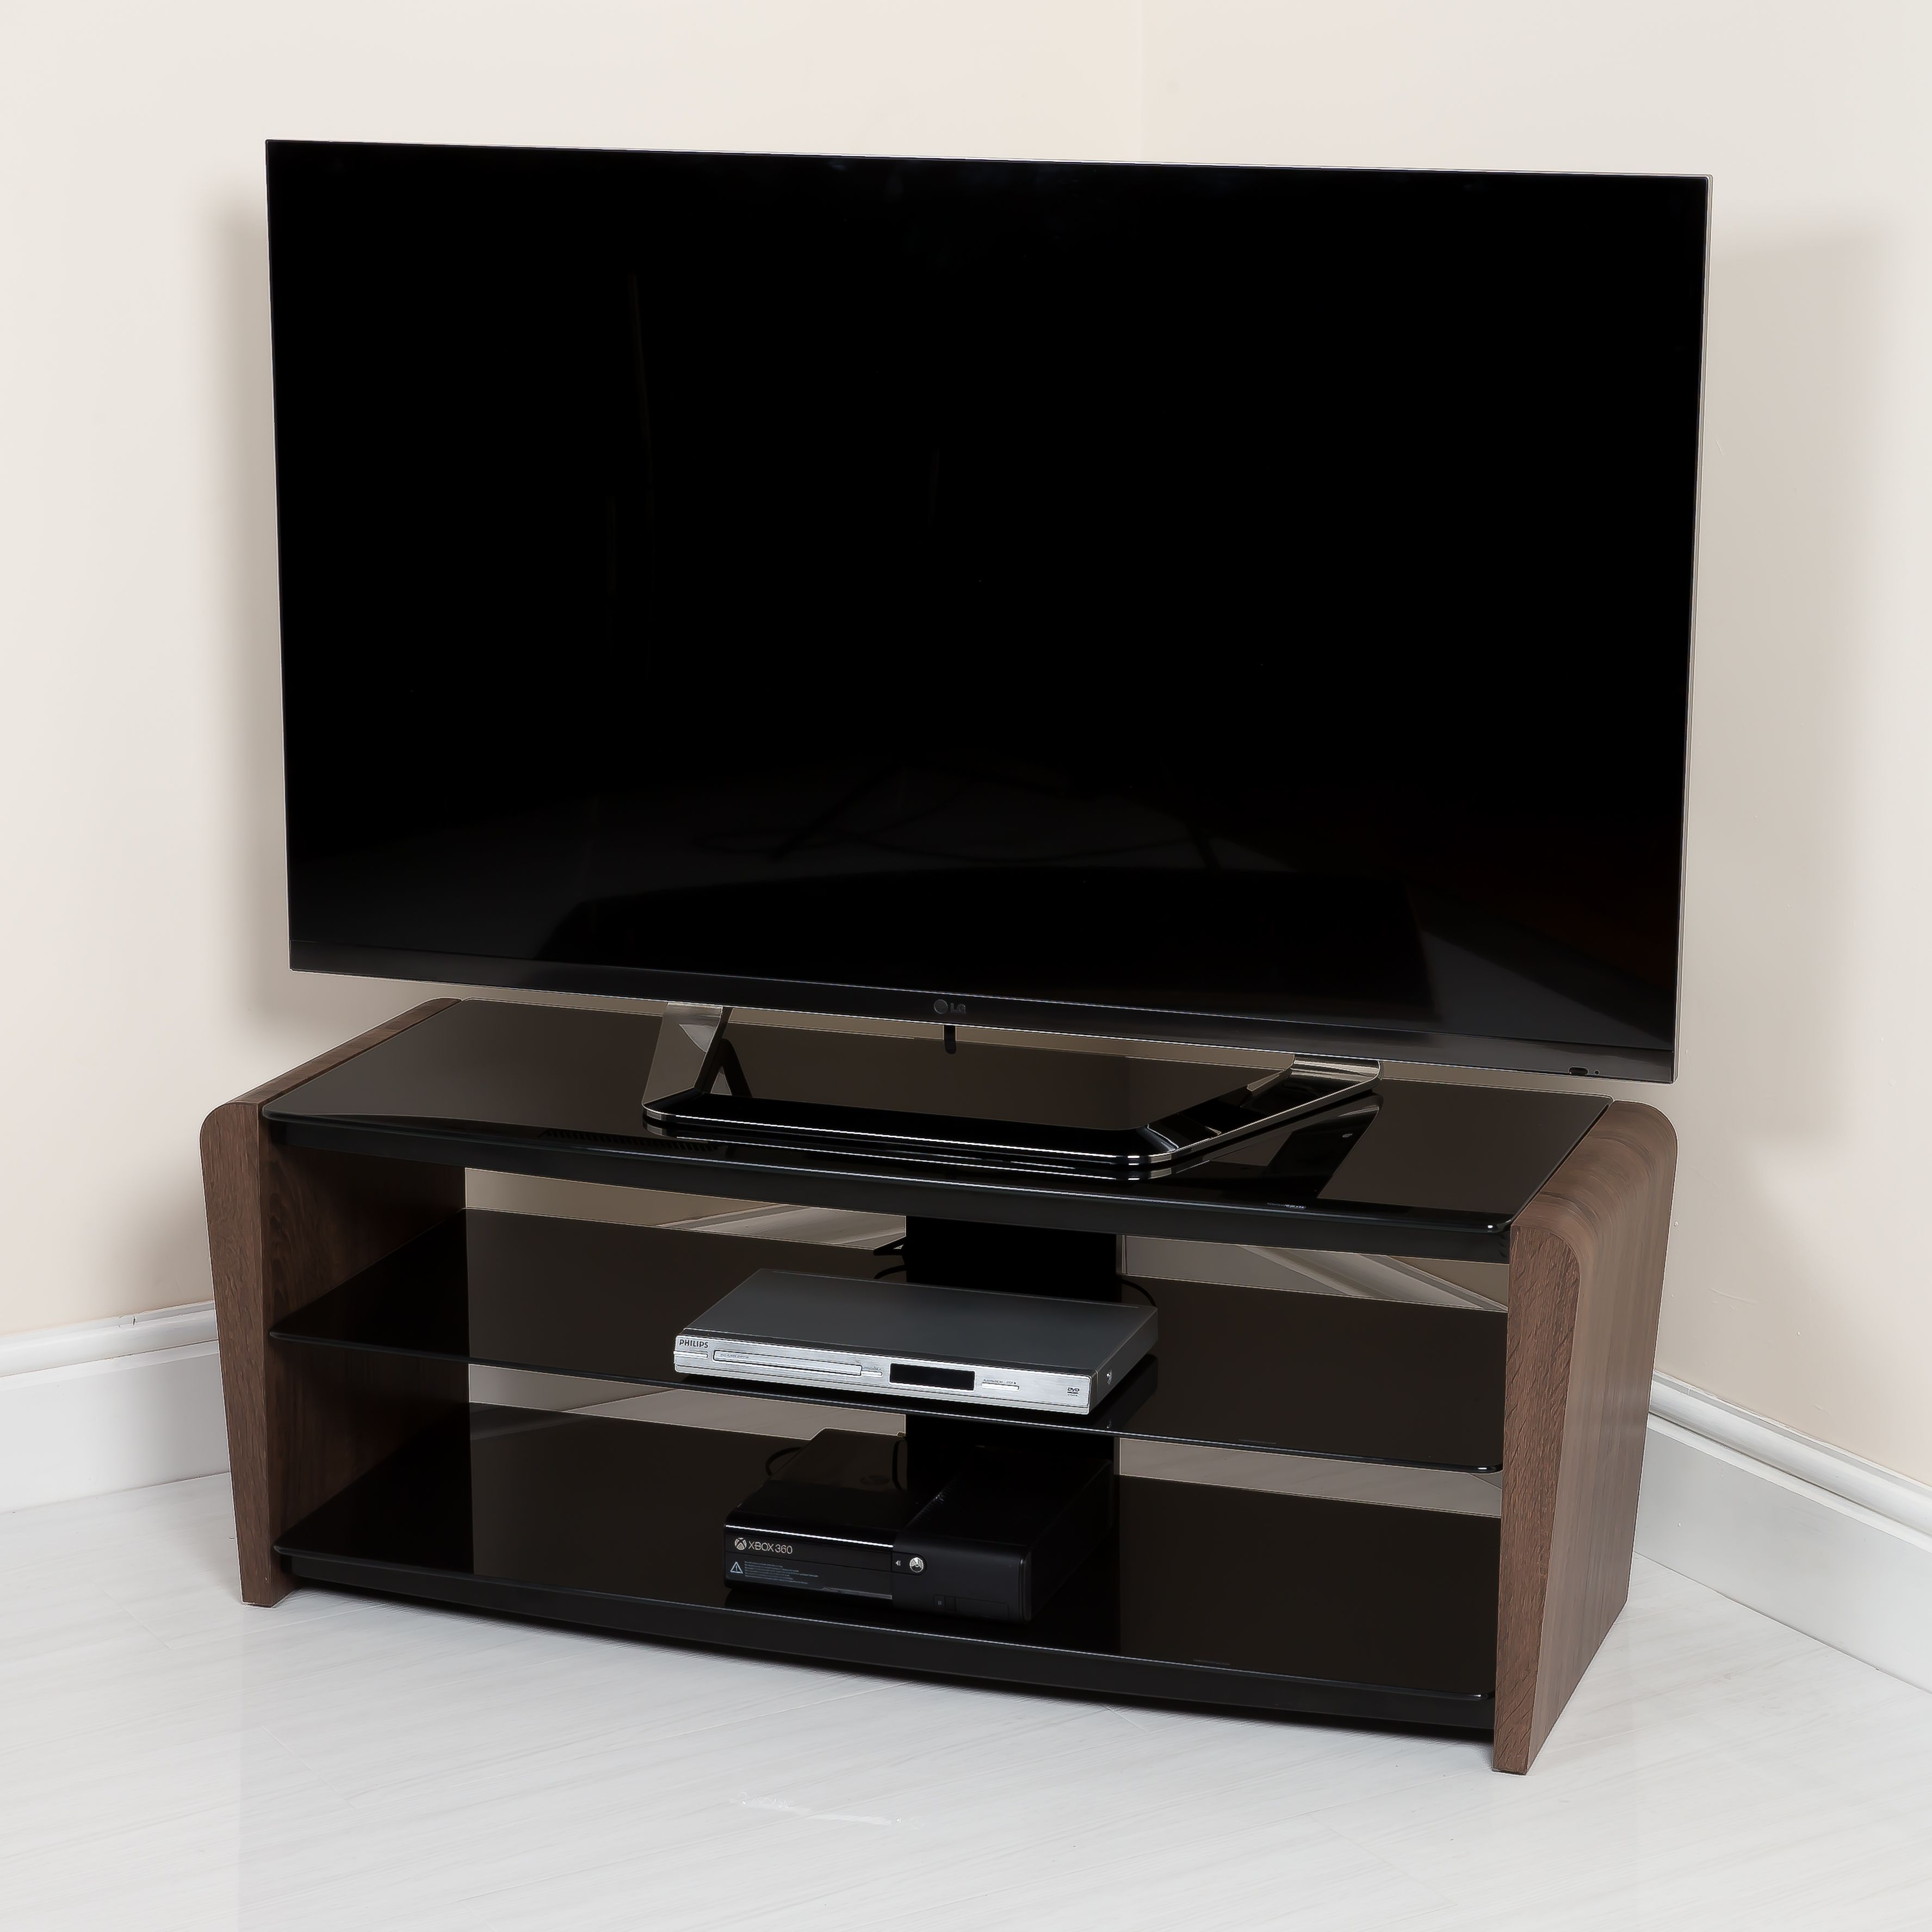 http   abreo co uk living room furniture   Modern Tv StandsHigh GlossLiving. http   abreo co uk living room furniture modern tv stands high